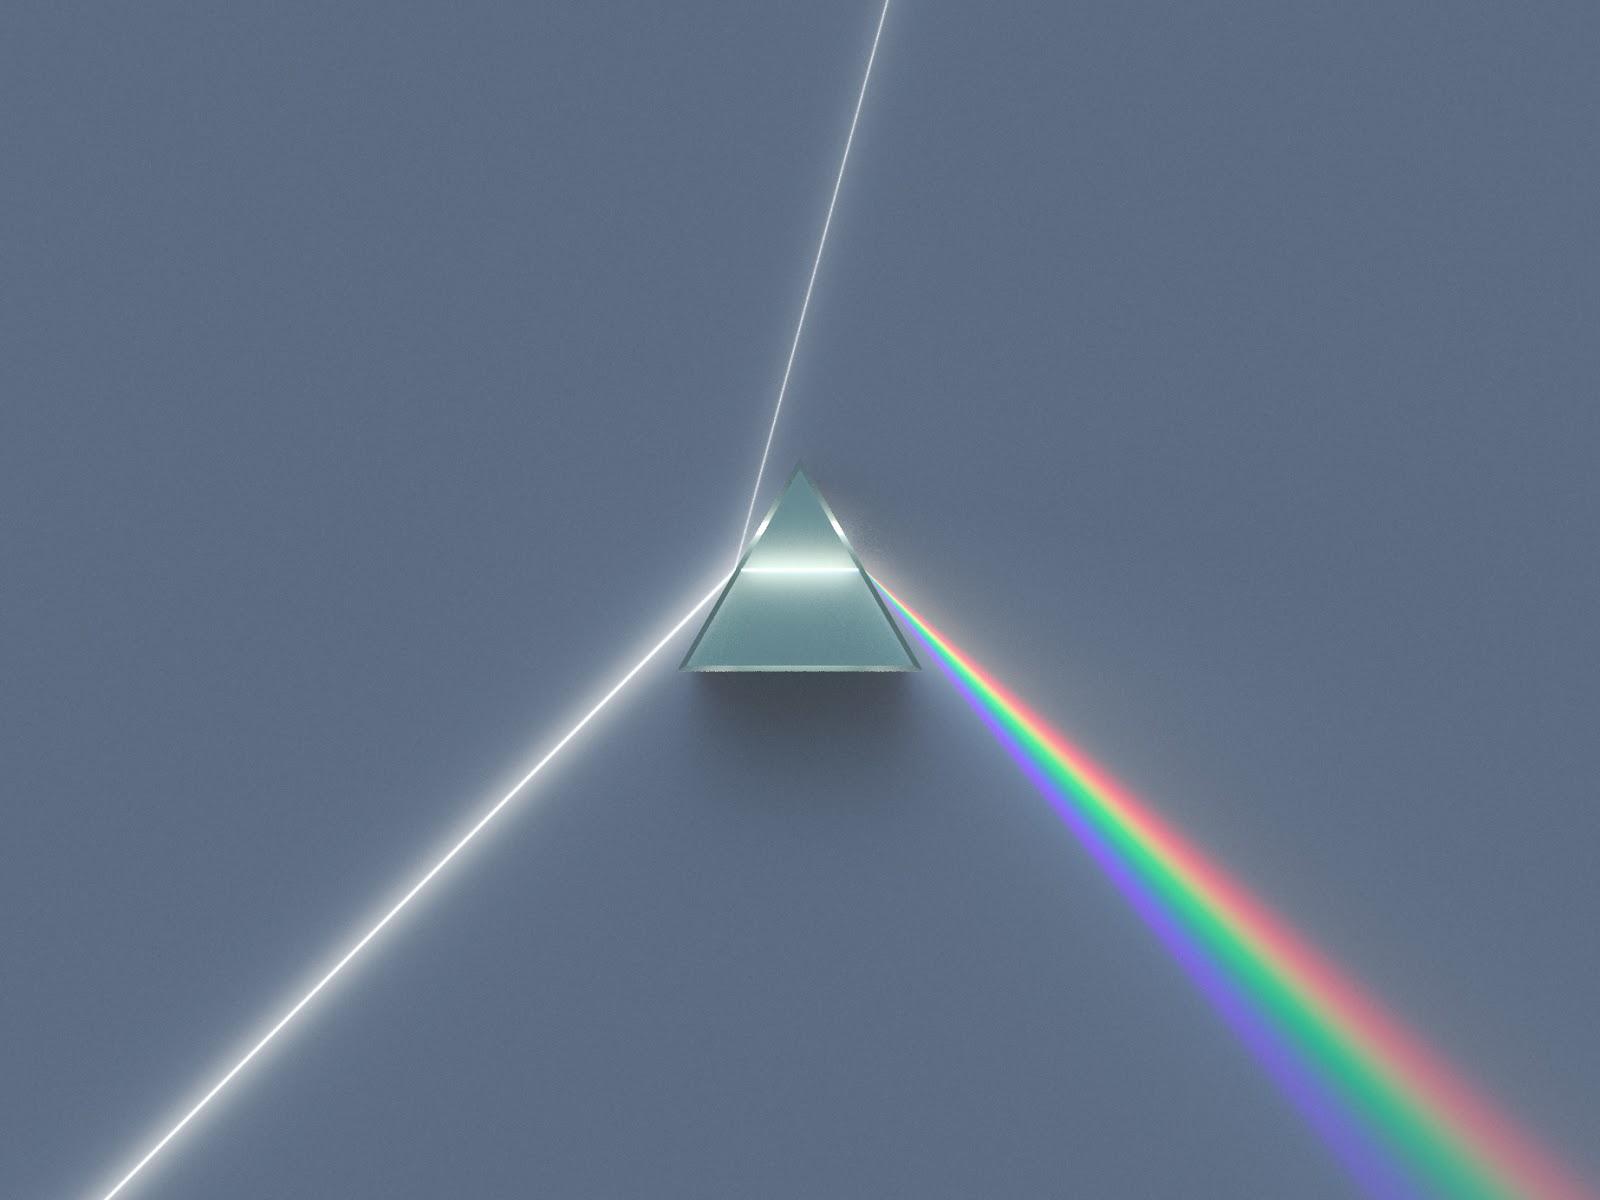 Morris Classical Academy: How Light Bends